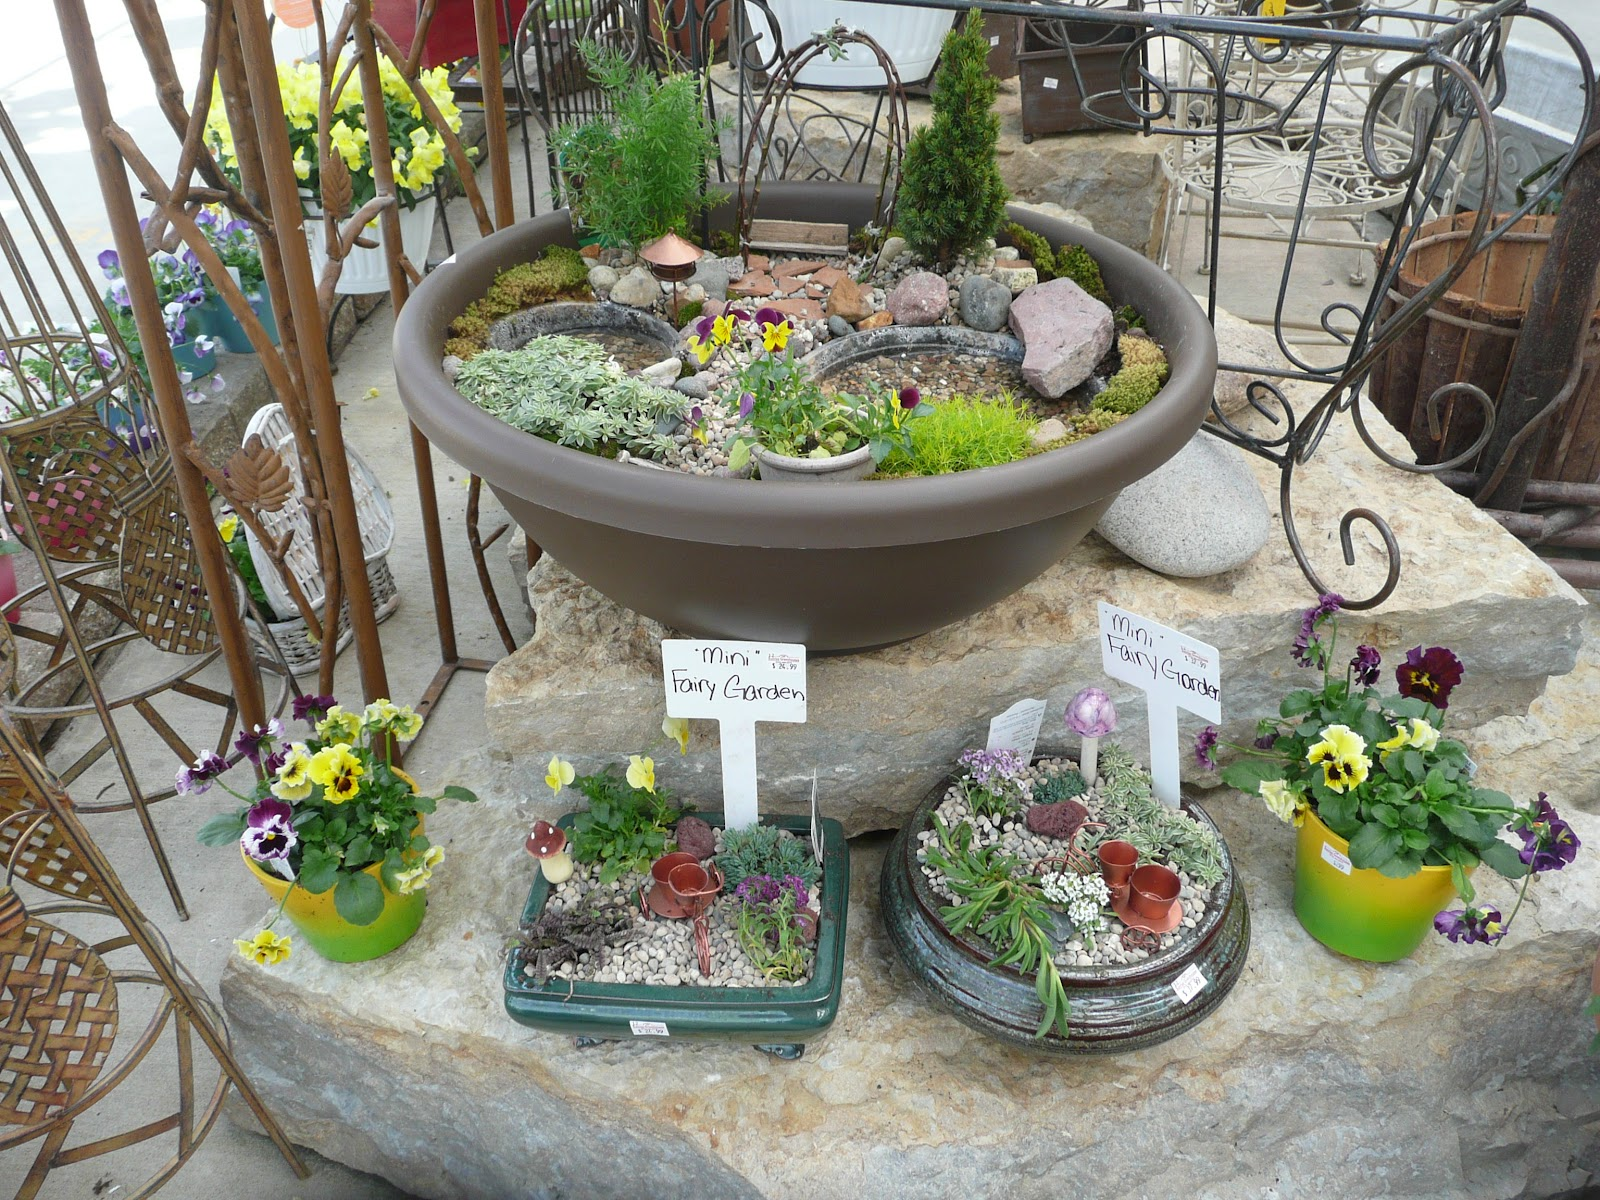 fairy garden ideas for small spaces image - Fairy Garden Ideas For Small Spaces